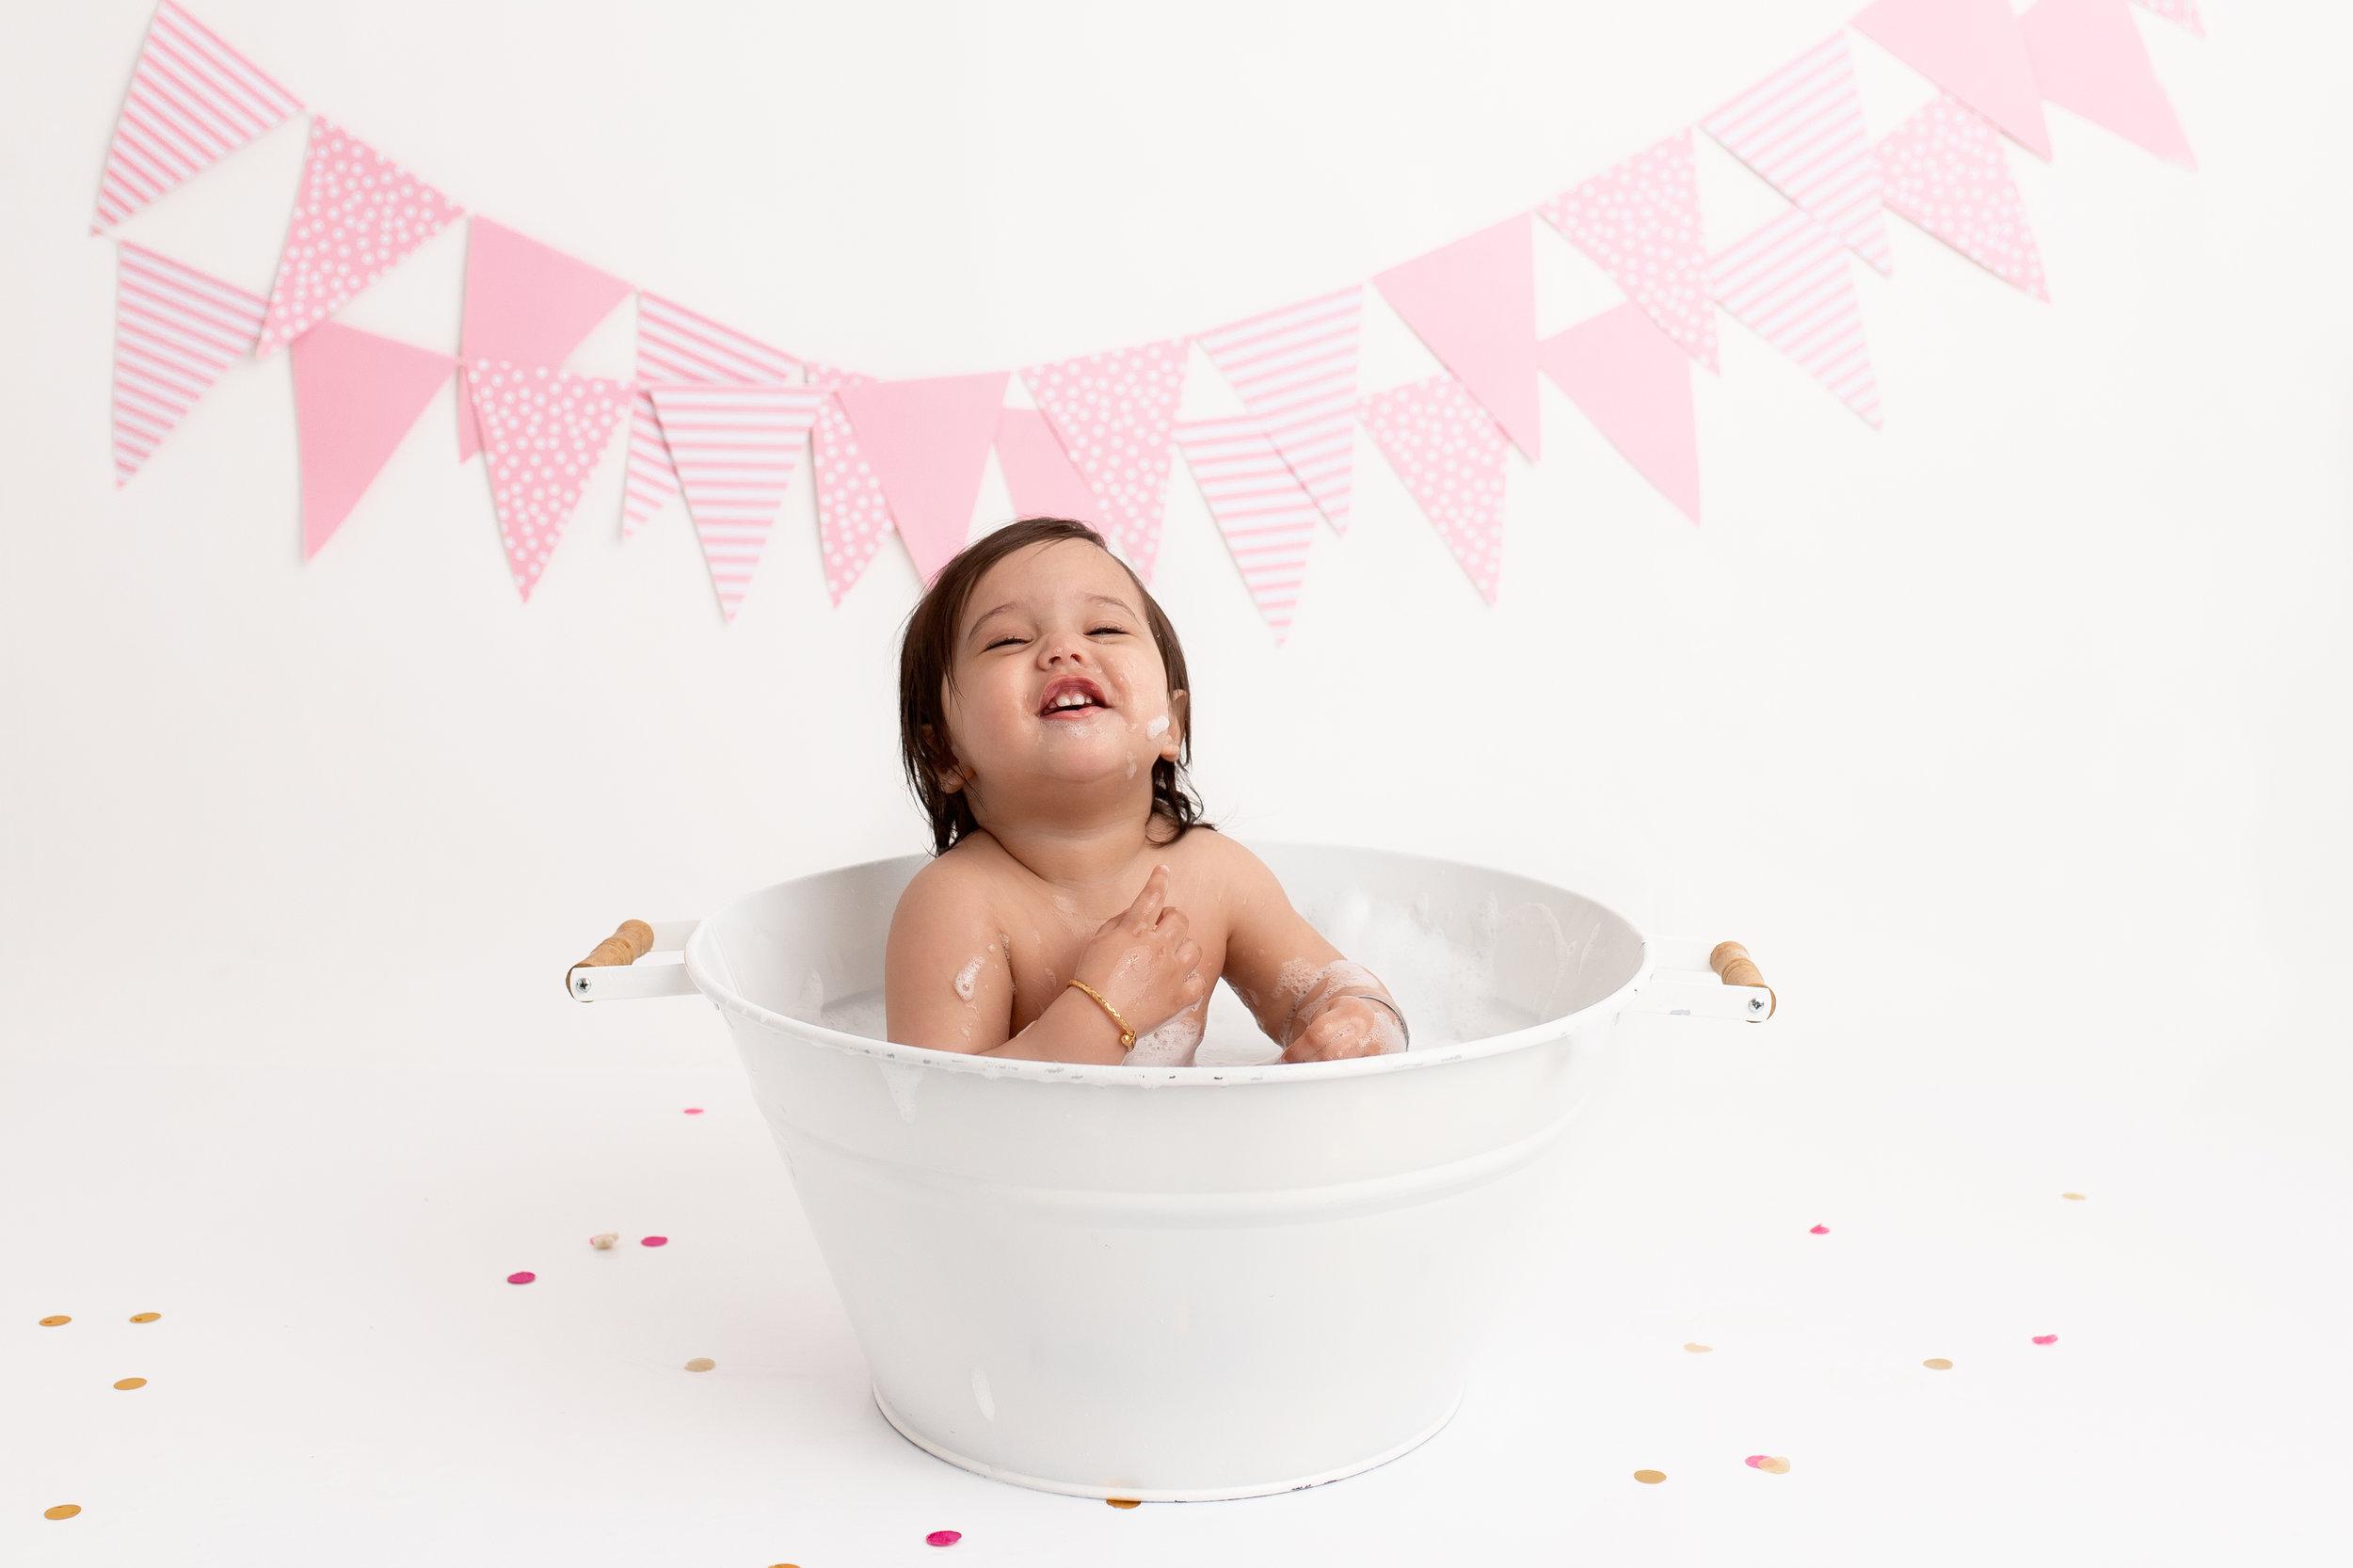 cake smash session edmonton best milestone photo session 1 year old photos photographer st-albert